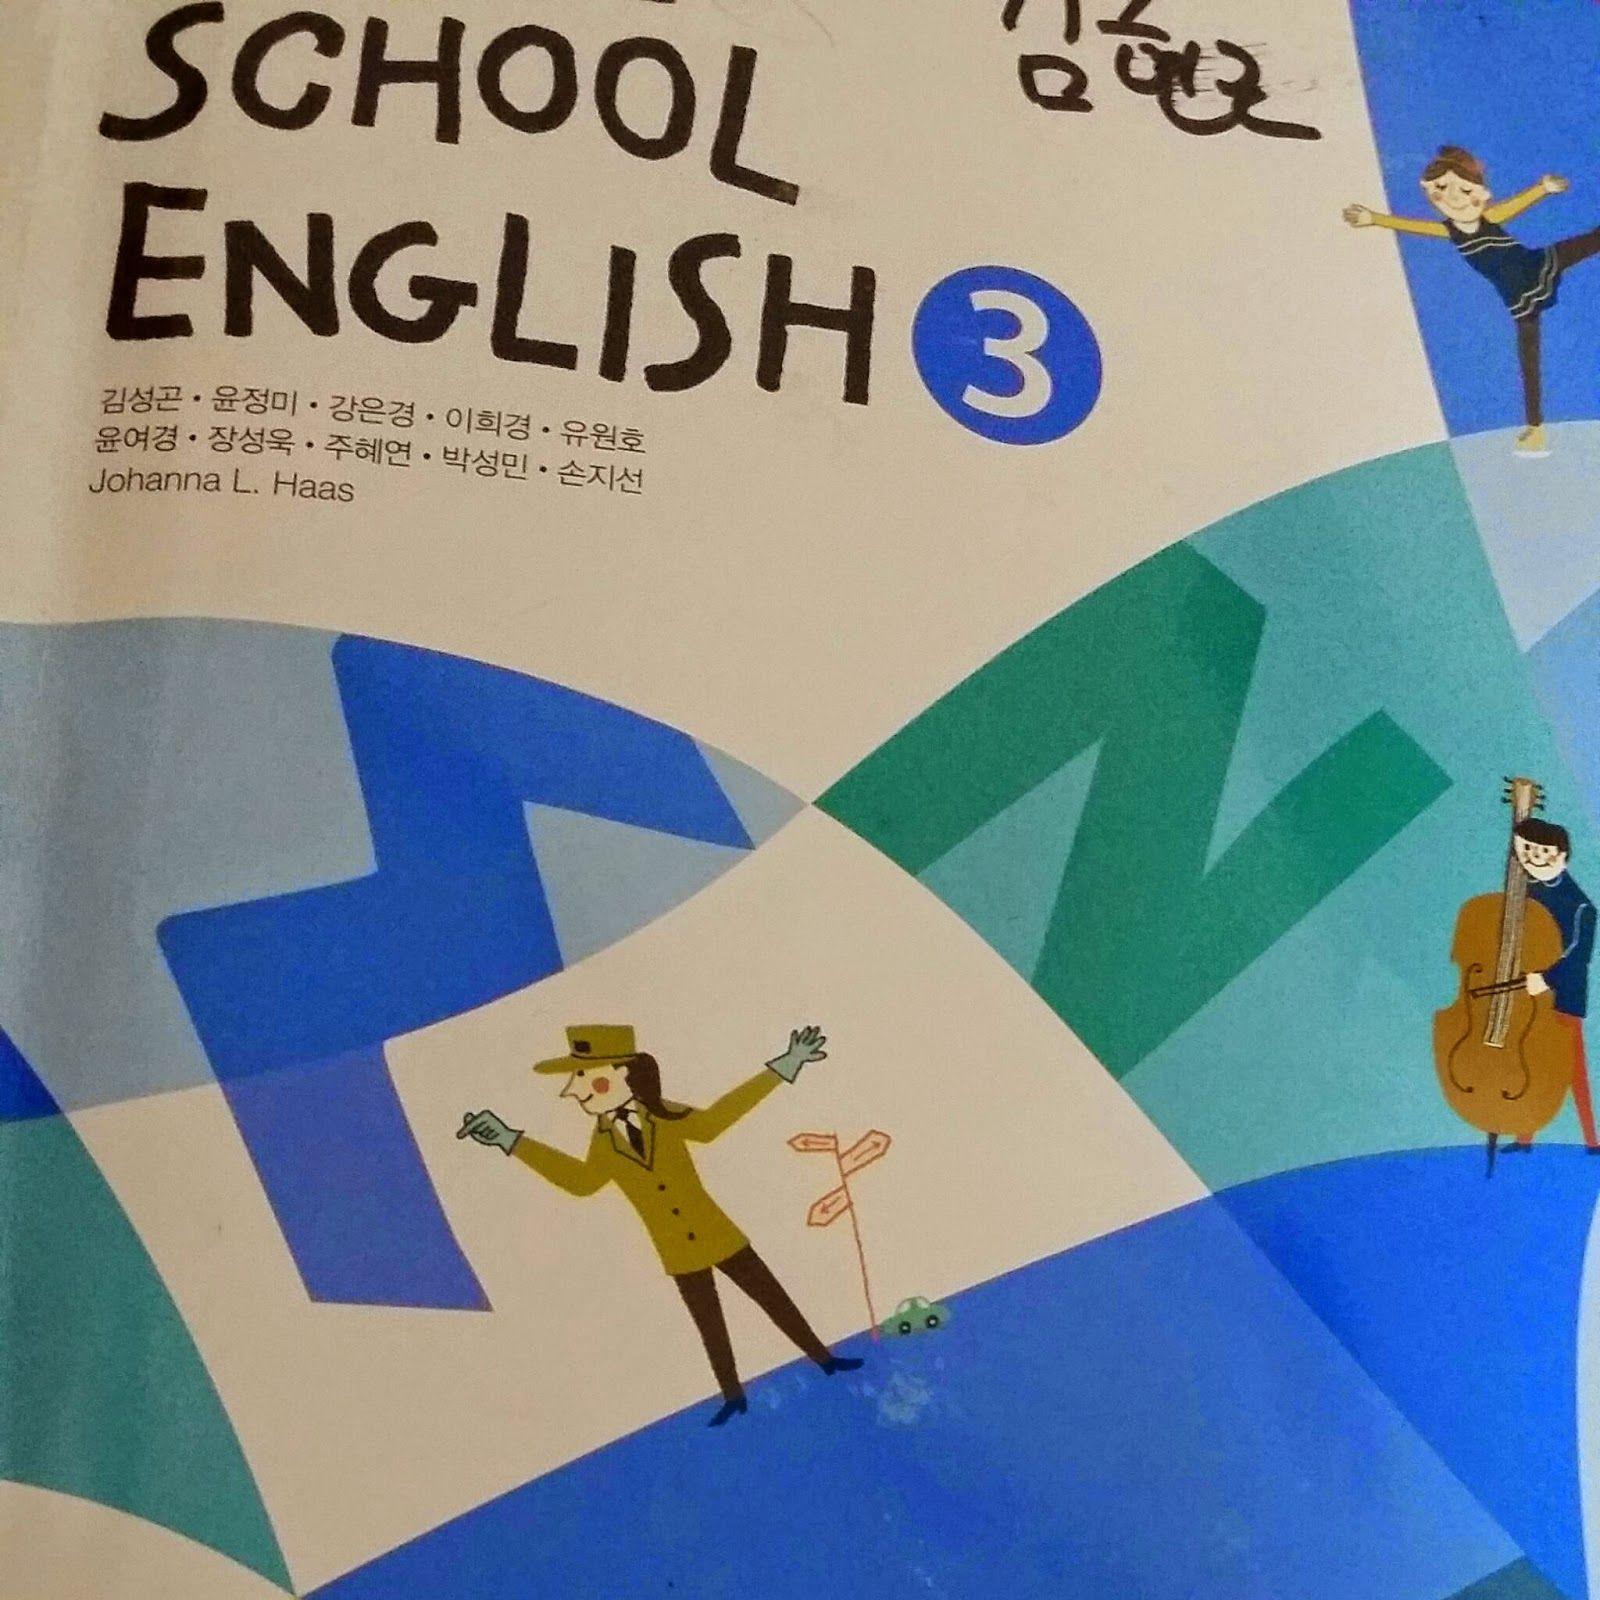 Raoul Teacher's English Empire: 교육의 미래에 대한 짧은 사색 ( 3 )